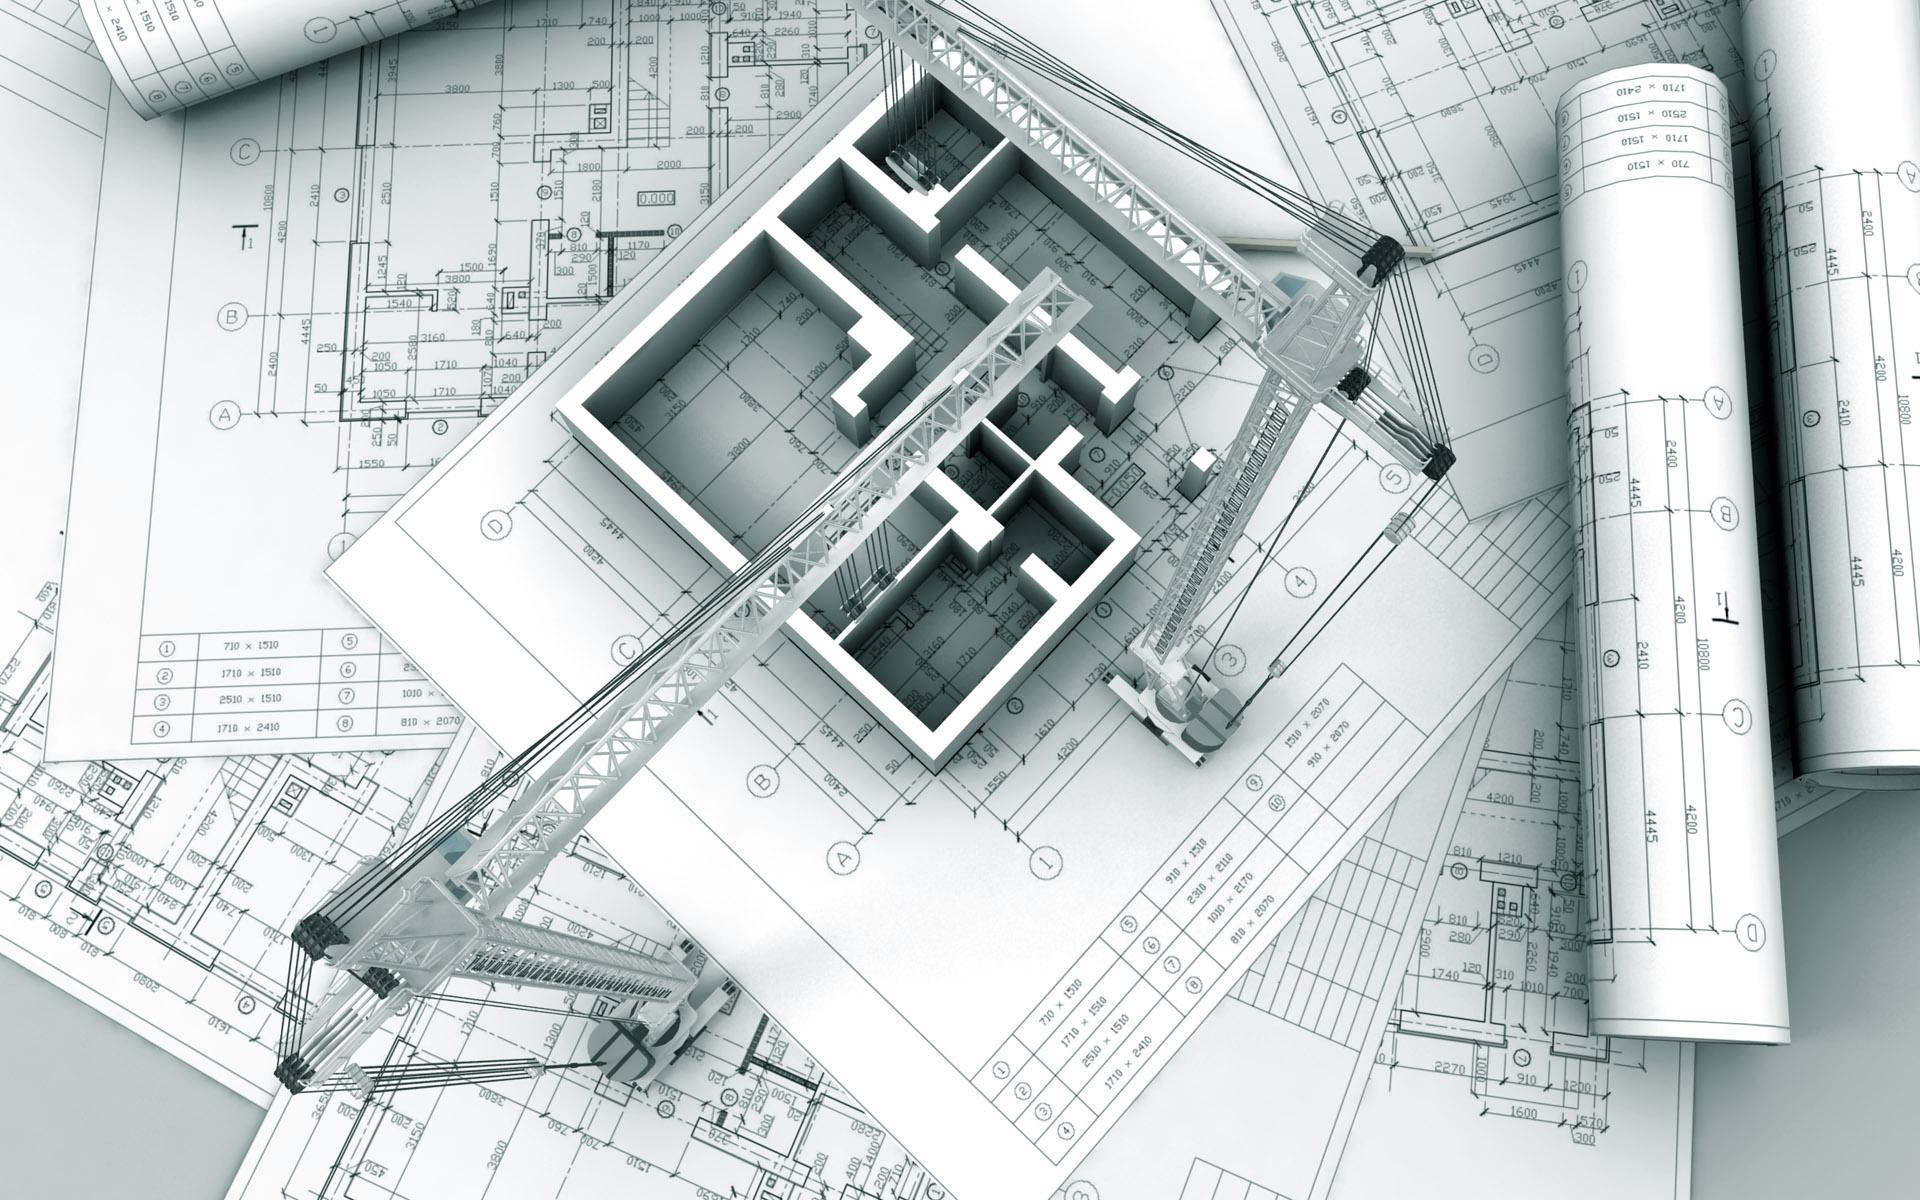 Building services design g b plan kft mrnkiroda malvernweather Image collections